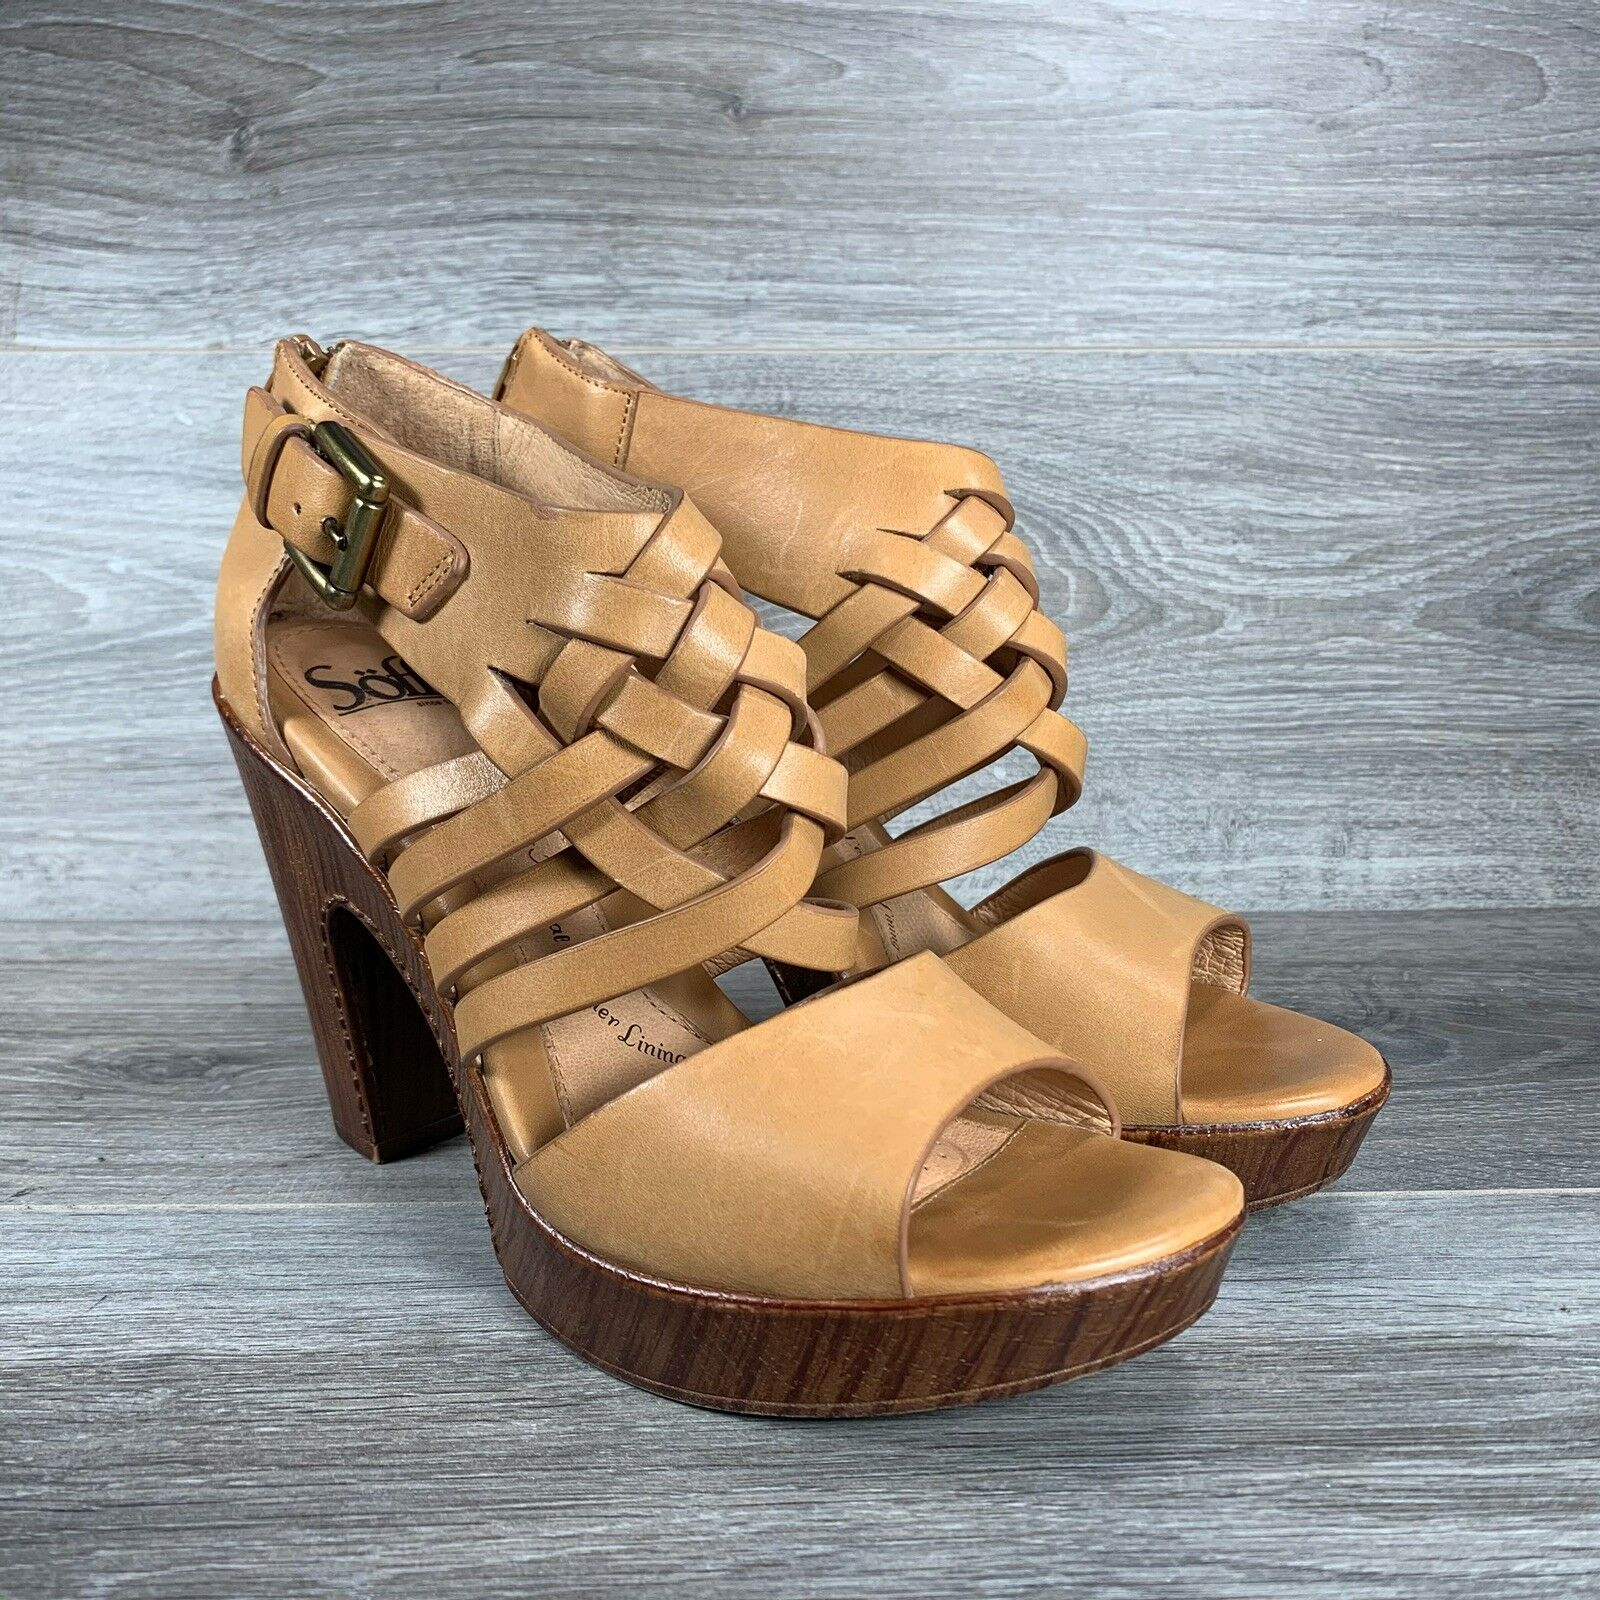 Sofft Ohanna Open Toe Gladiator Platform Heels Sandals Leather Tan Brown Sz 8 39